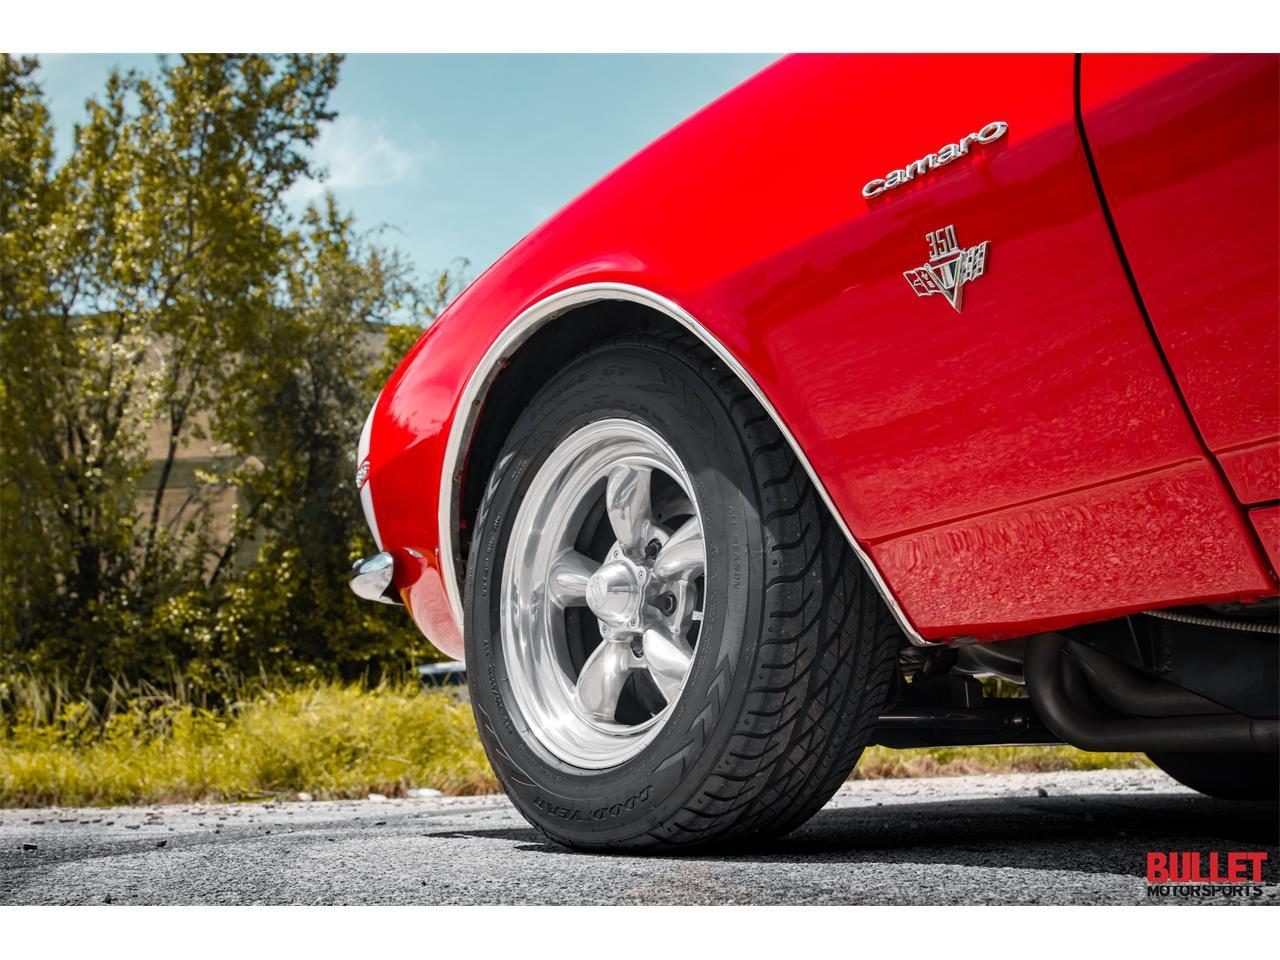 Large Picture of Classic 1967 Camaro located in Fort Lauderdale Florida - $49,950.00 - QIJZ